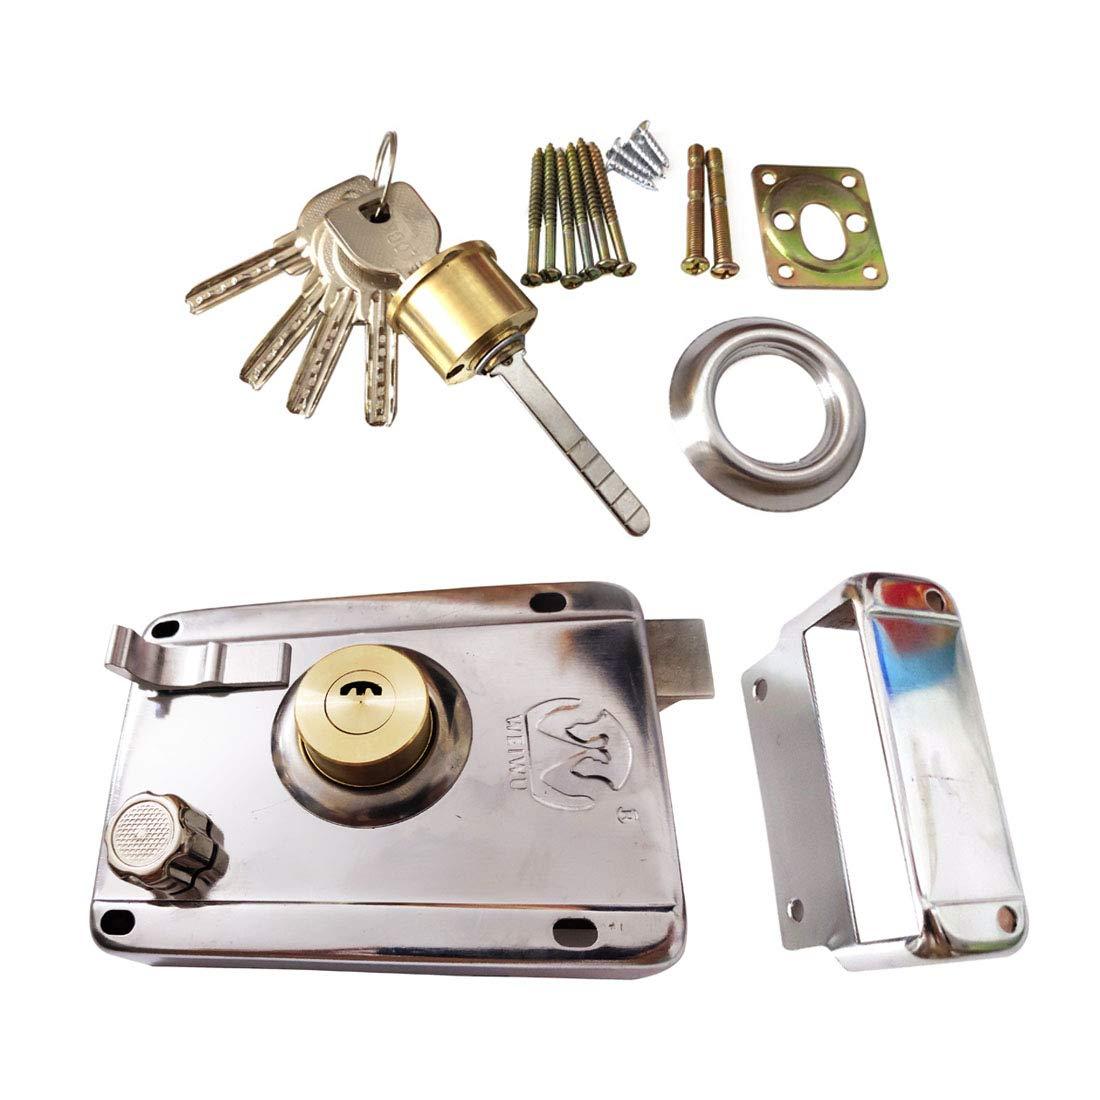 Sepuly Safety Vertical Keyway Cylinder Deadbolt Rim Lock Set Exterior Door Rim Lock 4.72x3.35inch Anti-Theft Lock for Home